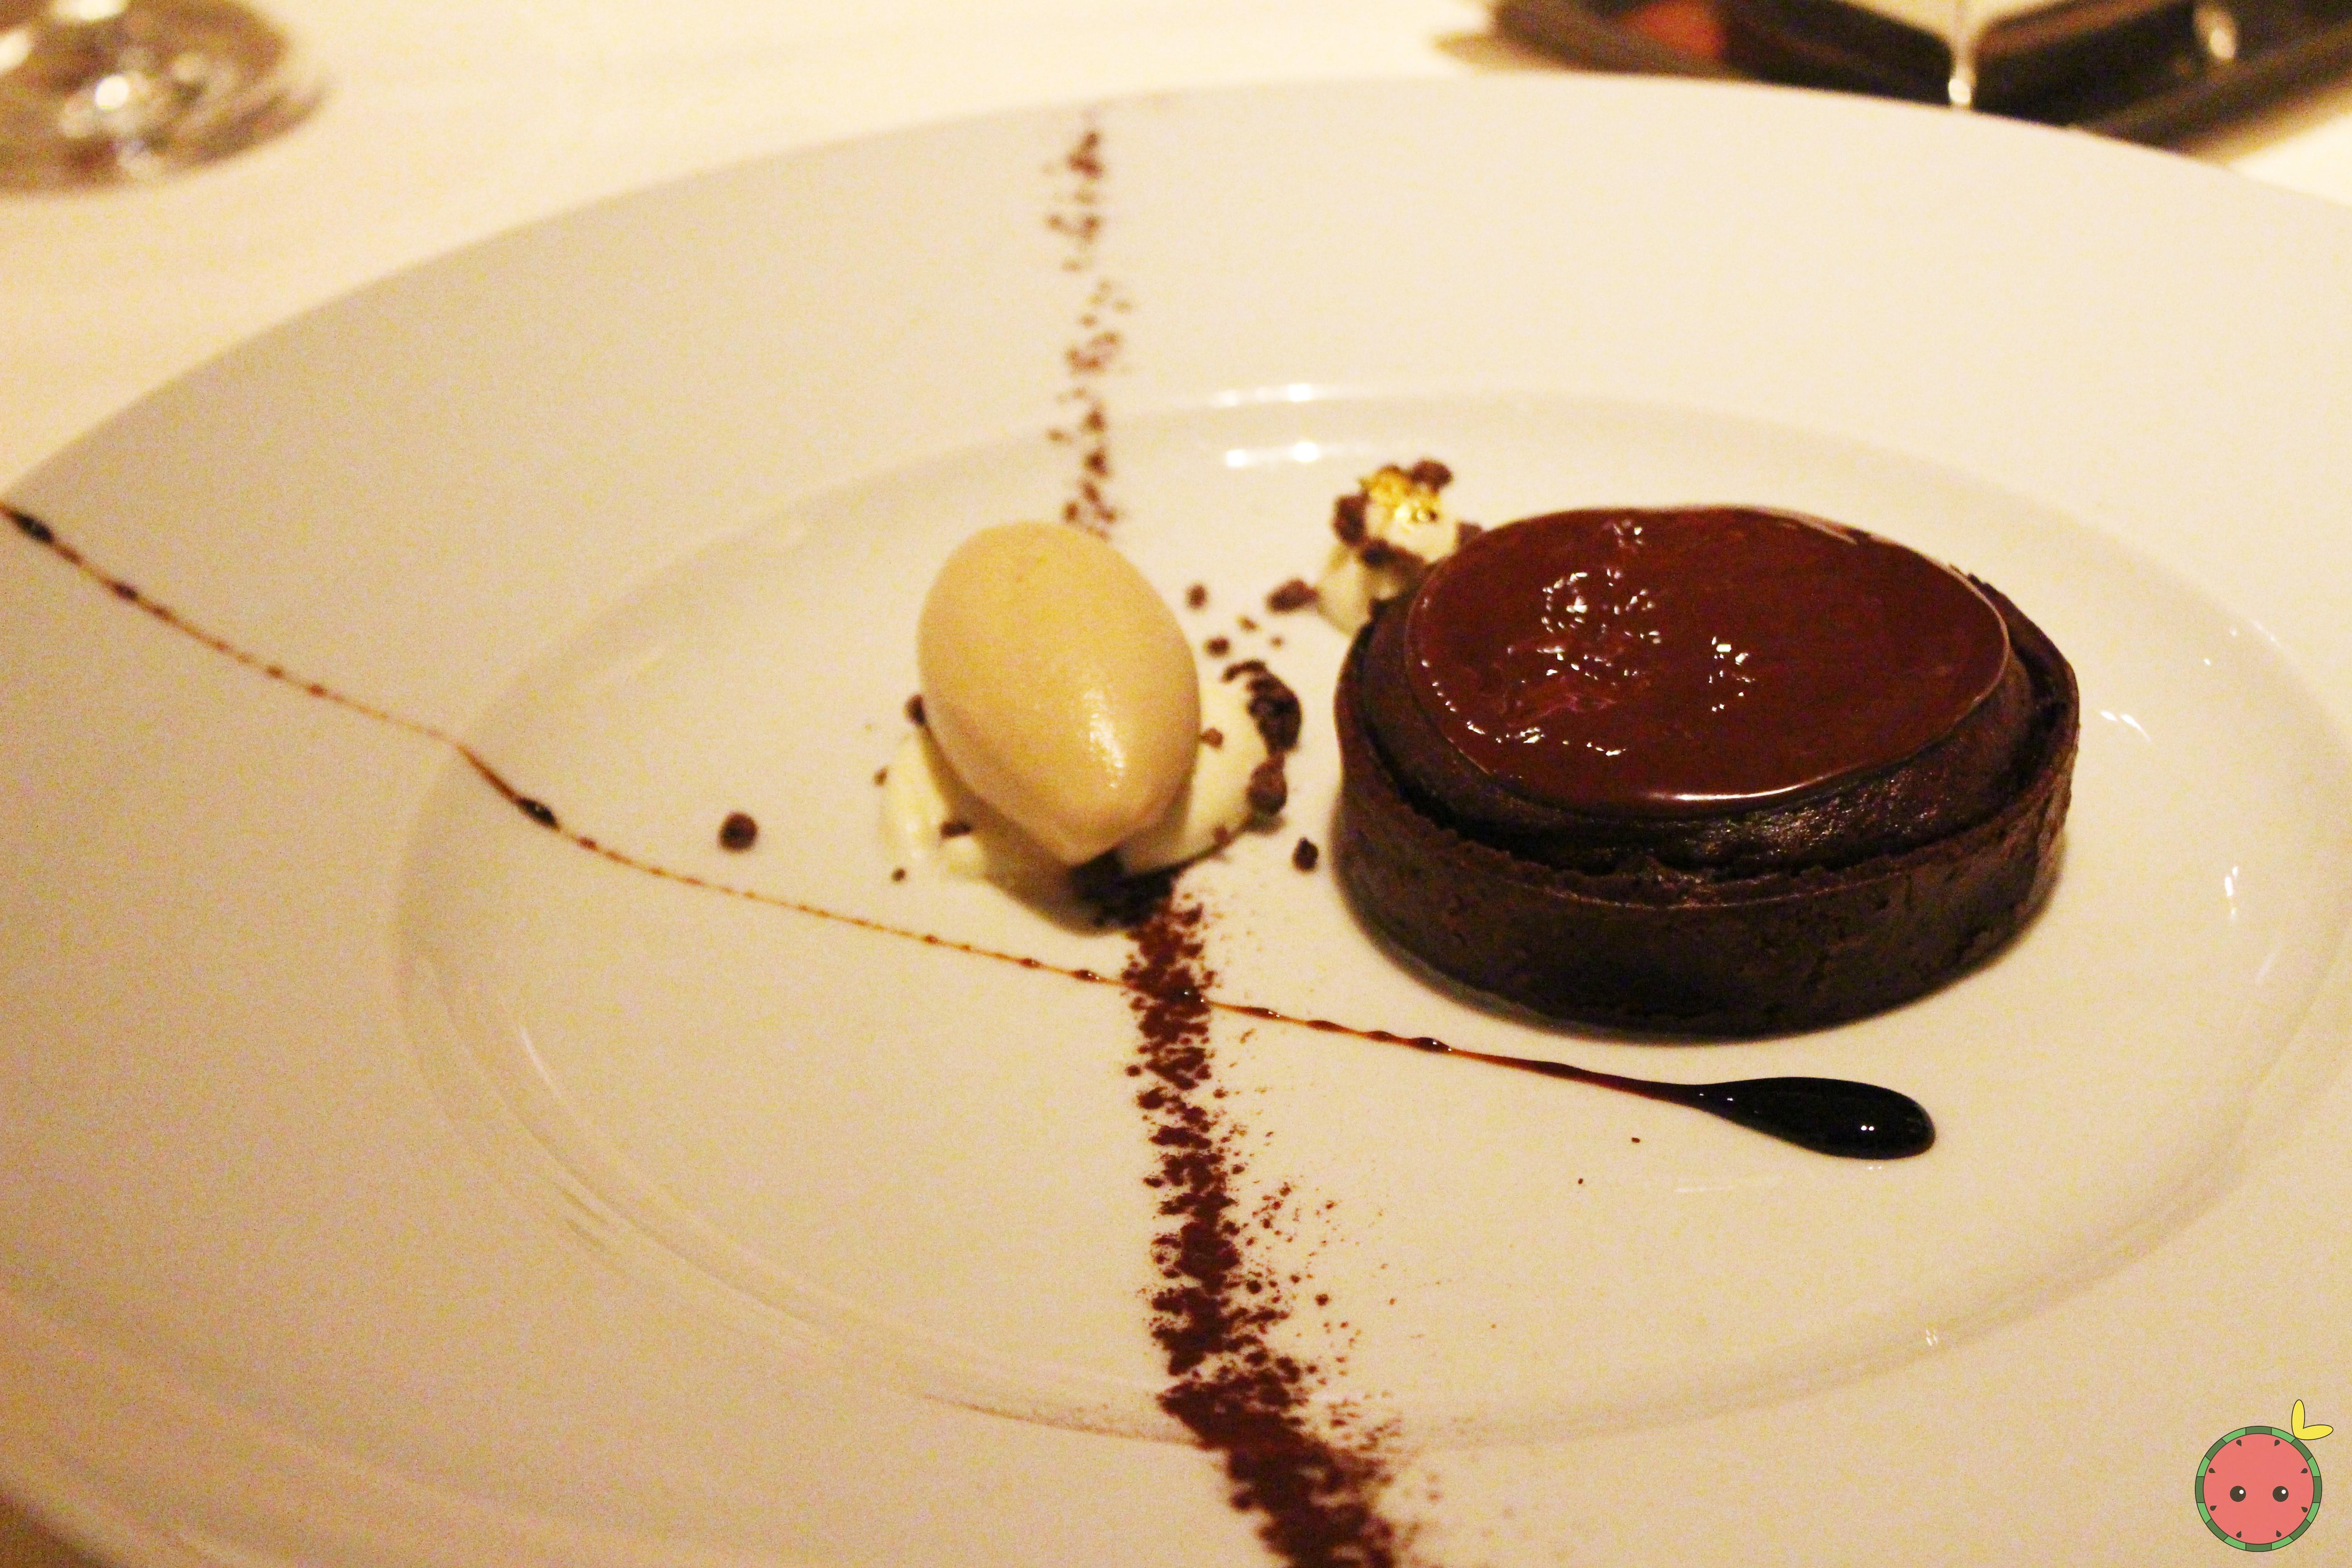 Tartaletta - Loma Sotavento 72% ganache, chocolate chiboust, tiramisu gelato